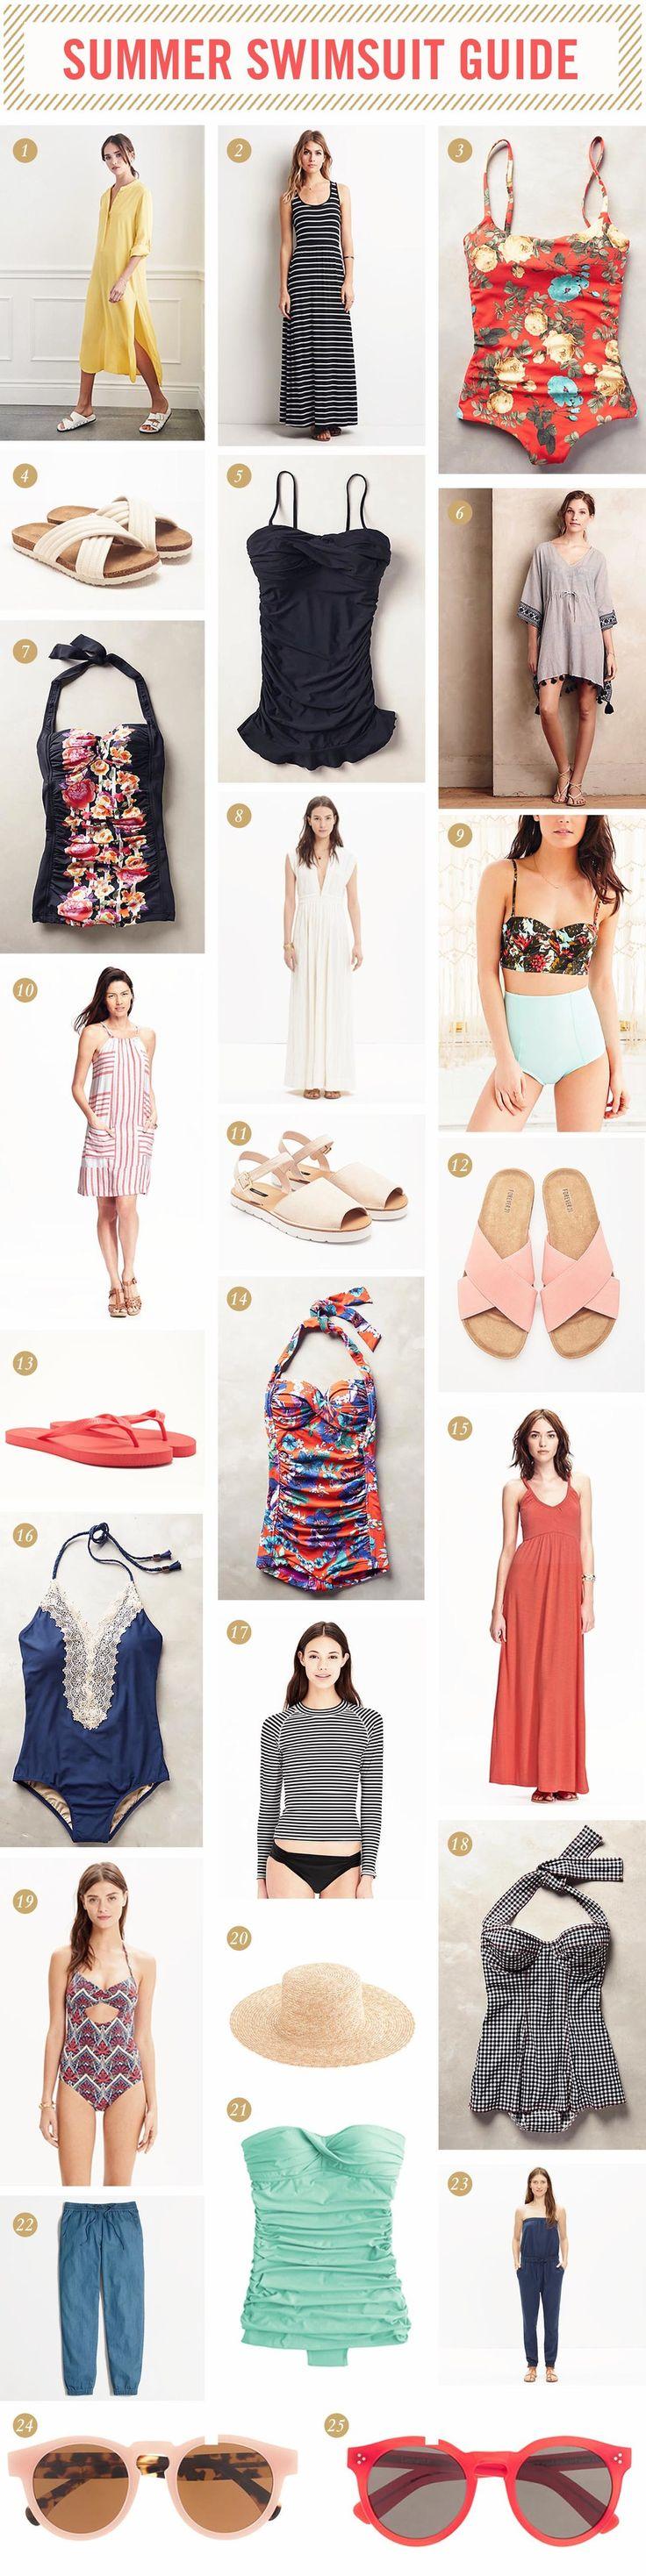 2015 Summer Swimsuit Guide — West Coast Capri